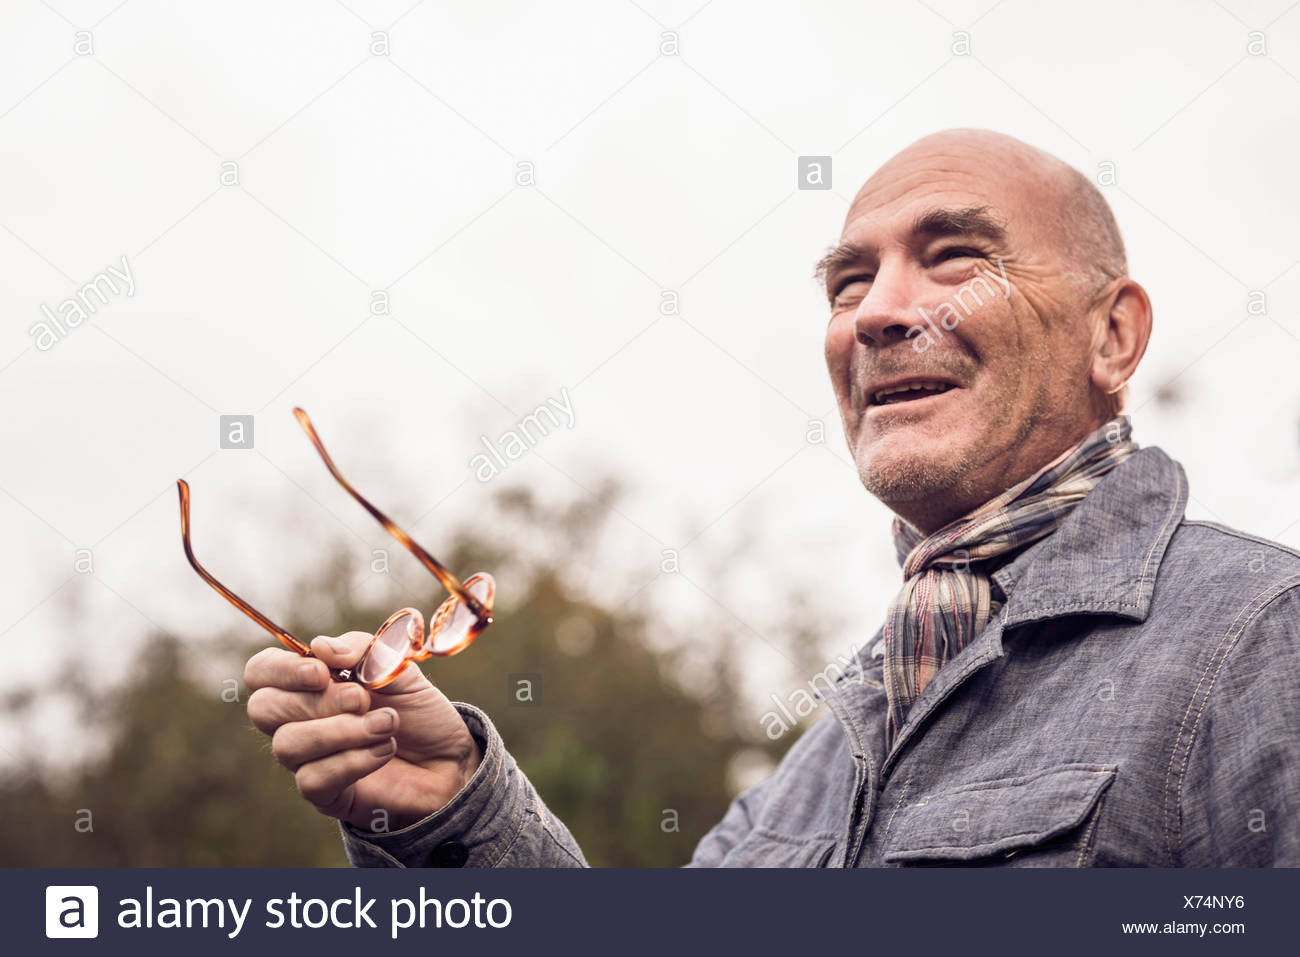 Senior man gesturing avec des lunettes Photo Stock